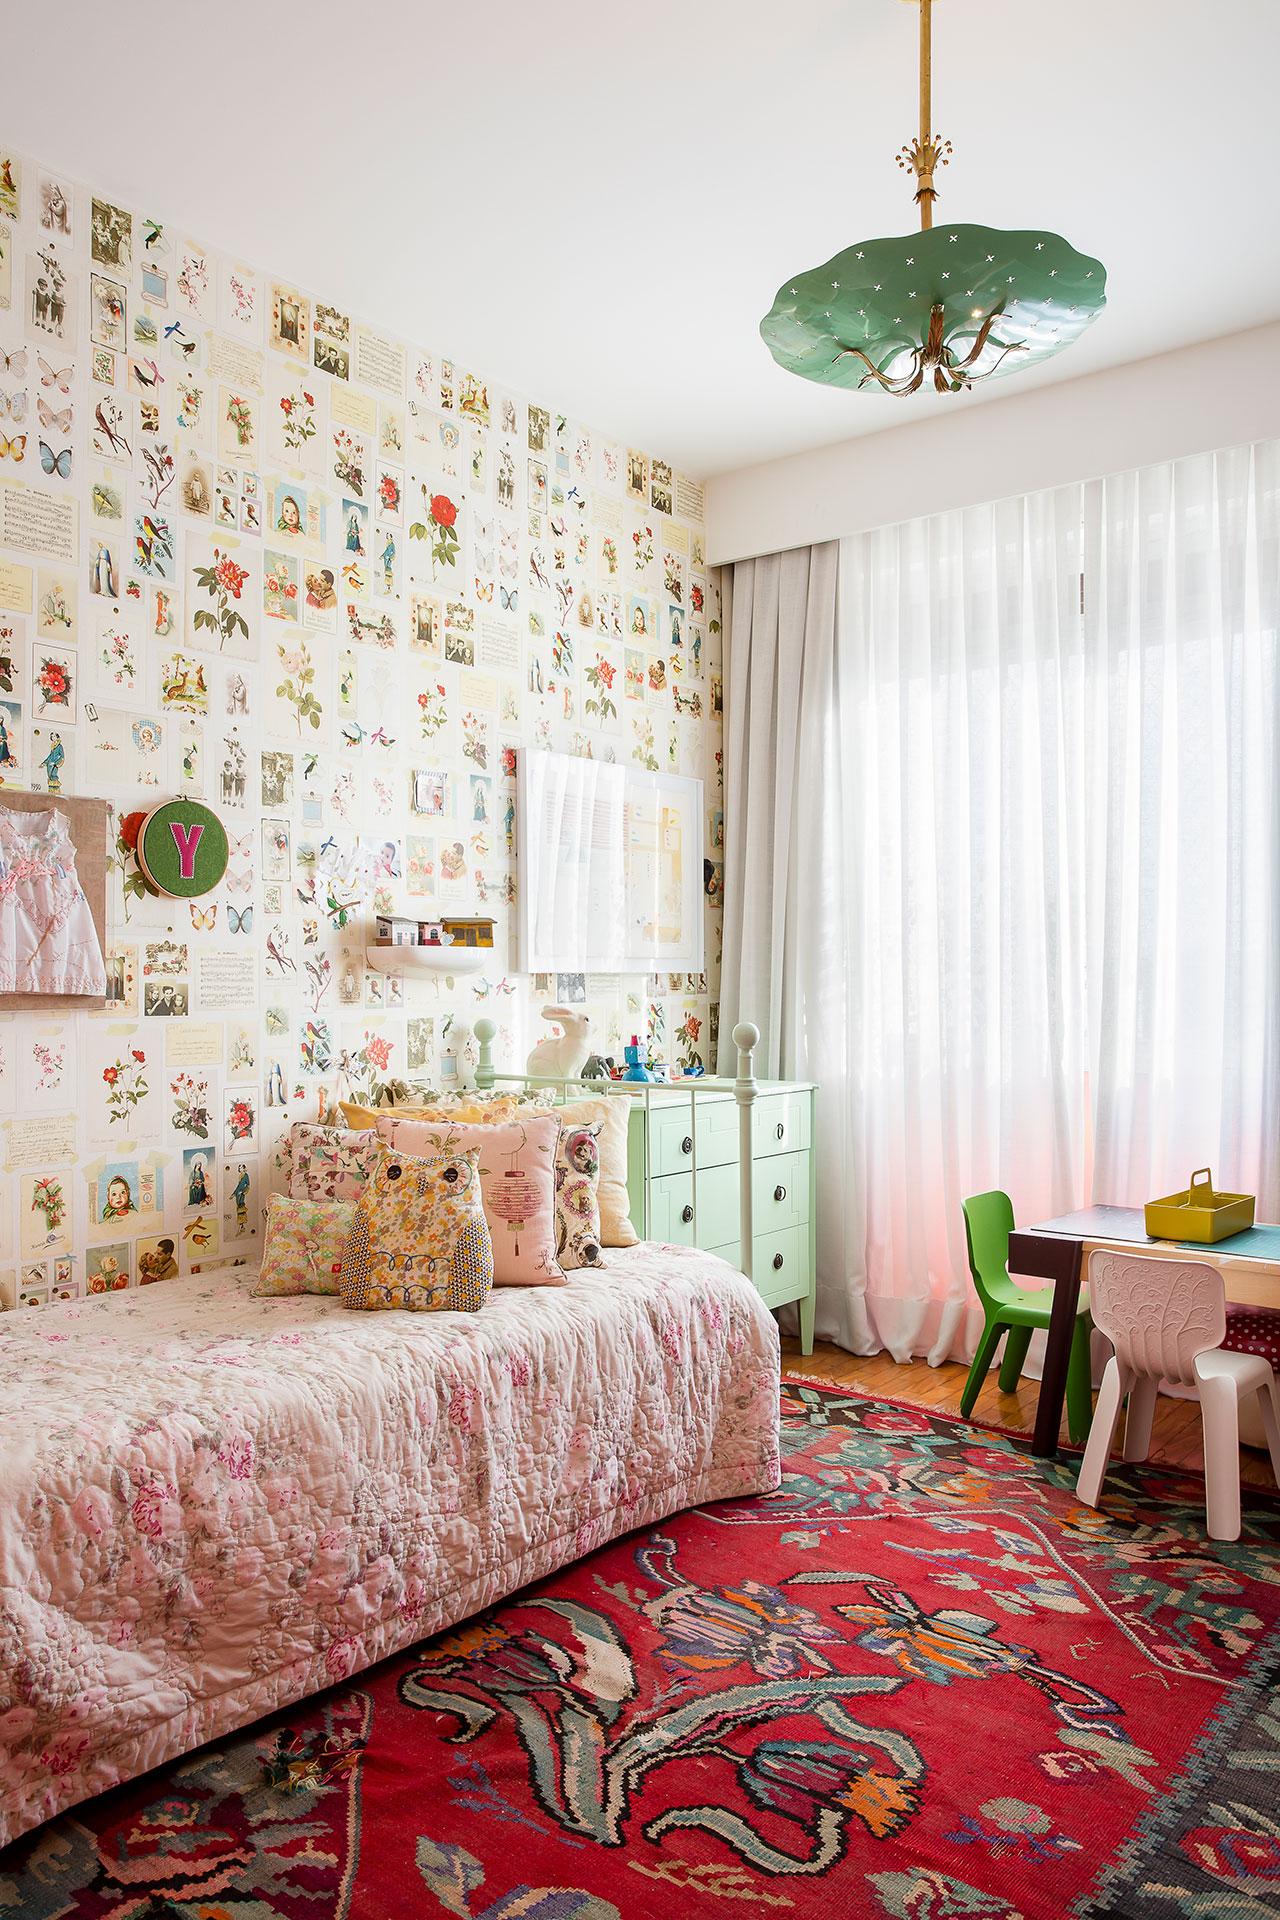 f7_ana_strumpf_apartment_ibiapinopolis_sao_paulo_brazil_yatzer